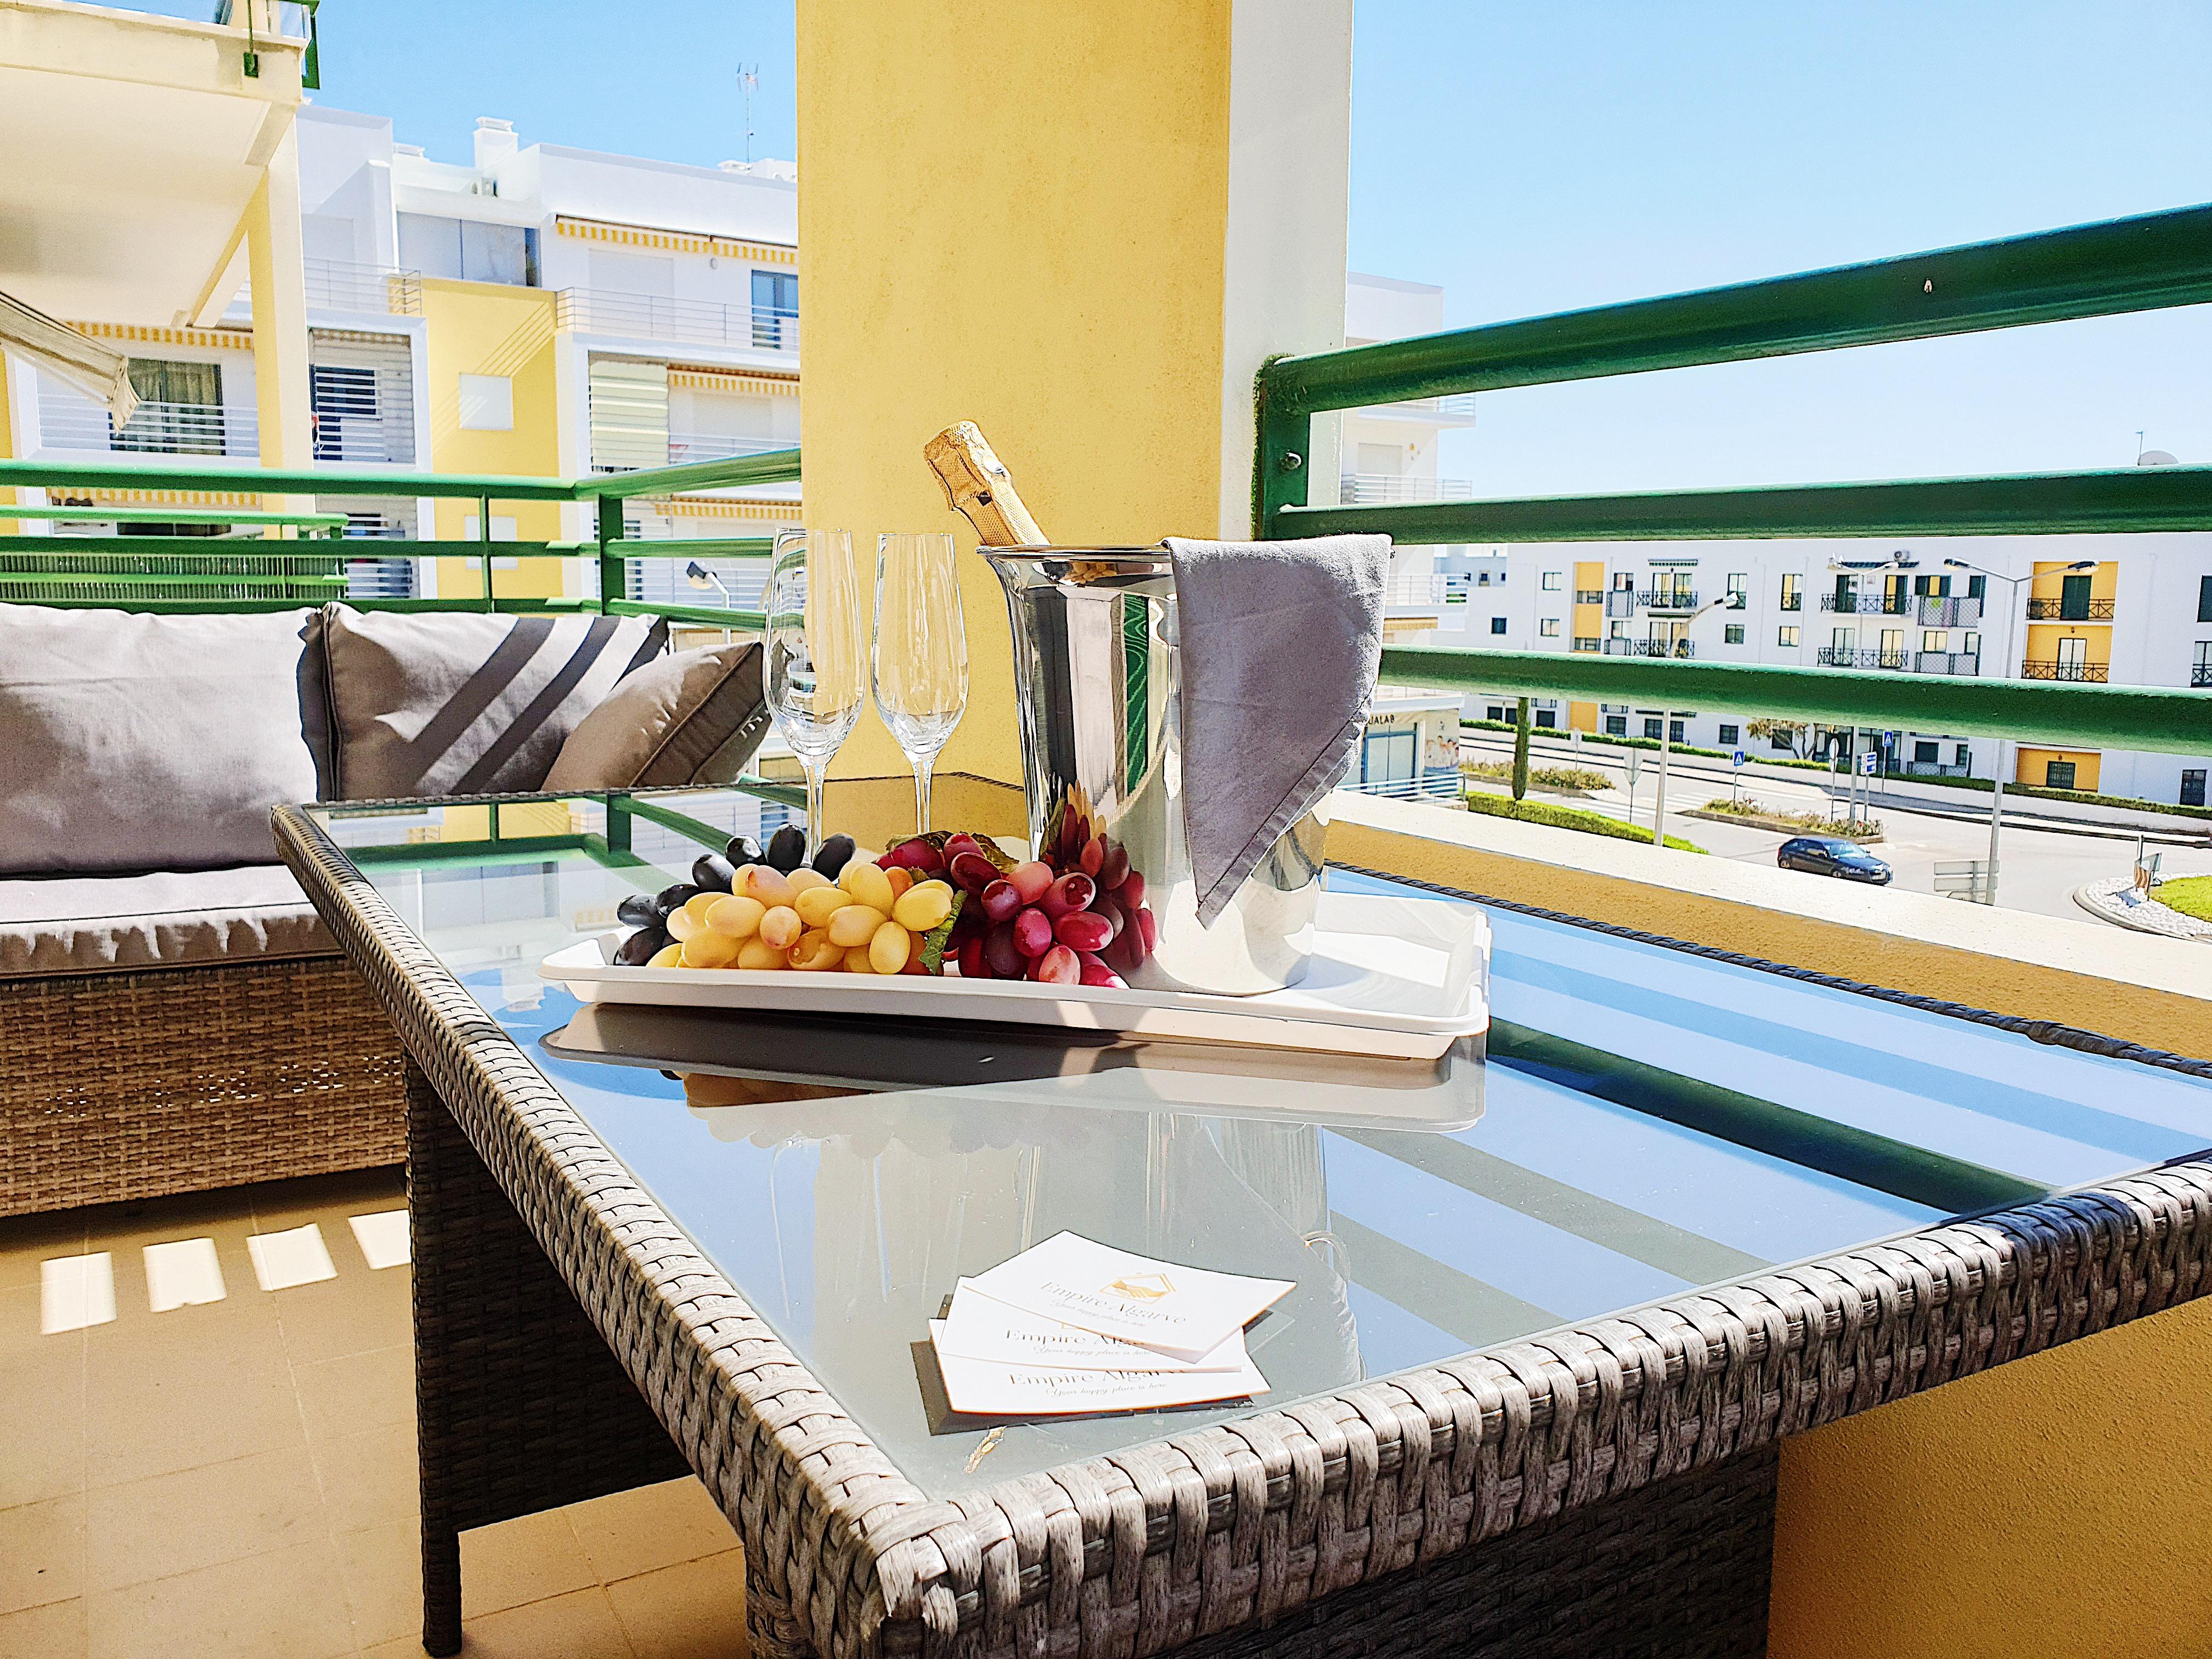 Location appartements et villas de vacance, Arrendamento para Férias – Location de vacance à Armação de Pêra, Portugal Algarve, REF_IMG_8959_8962